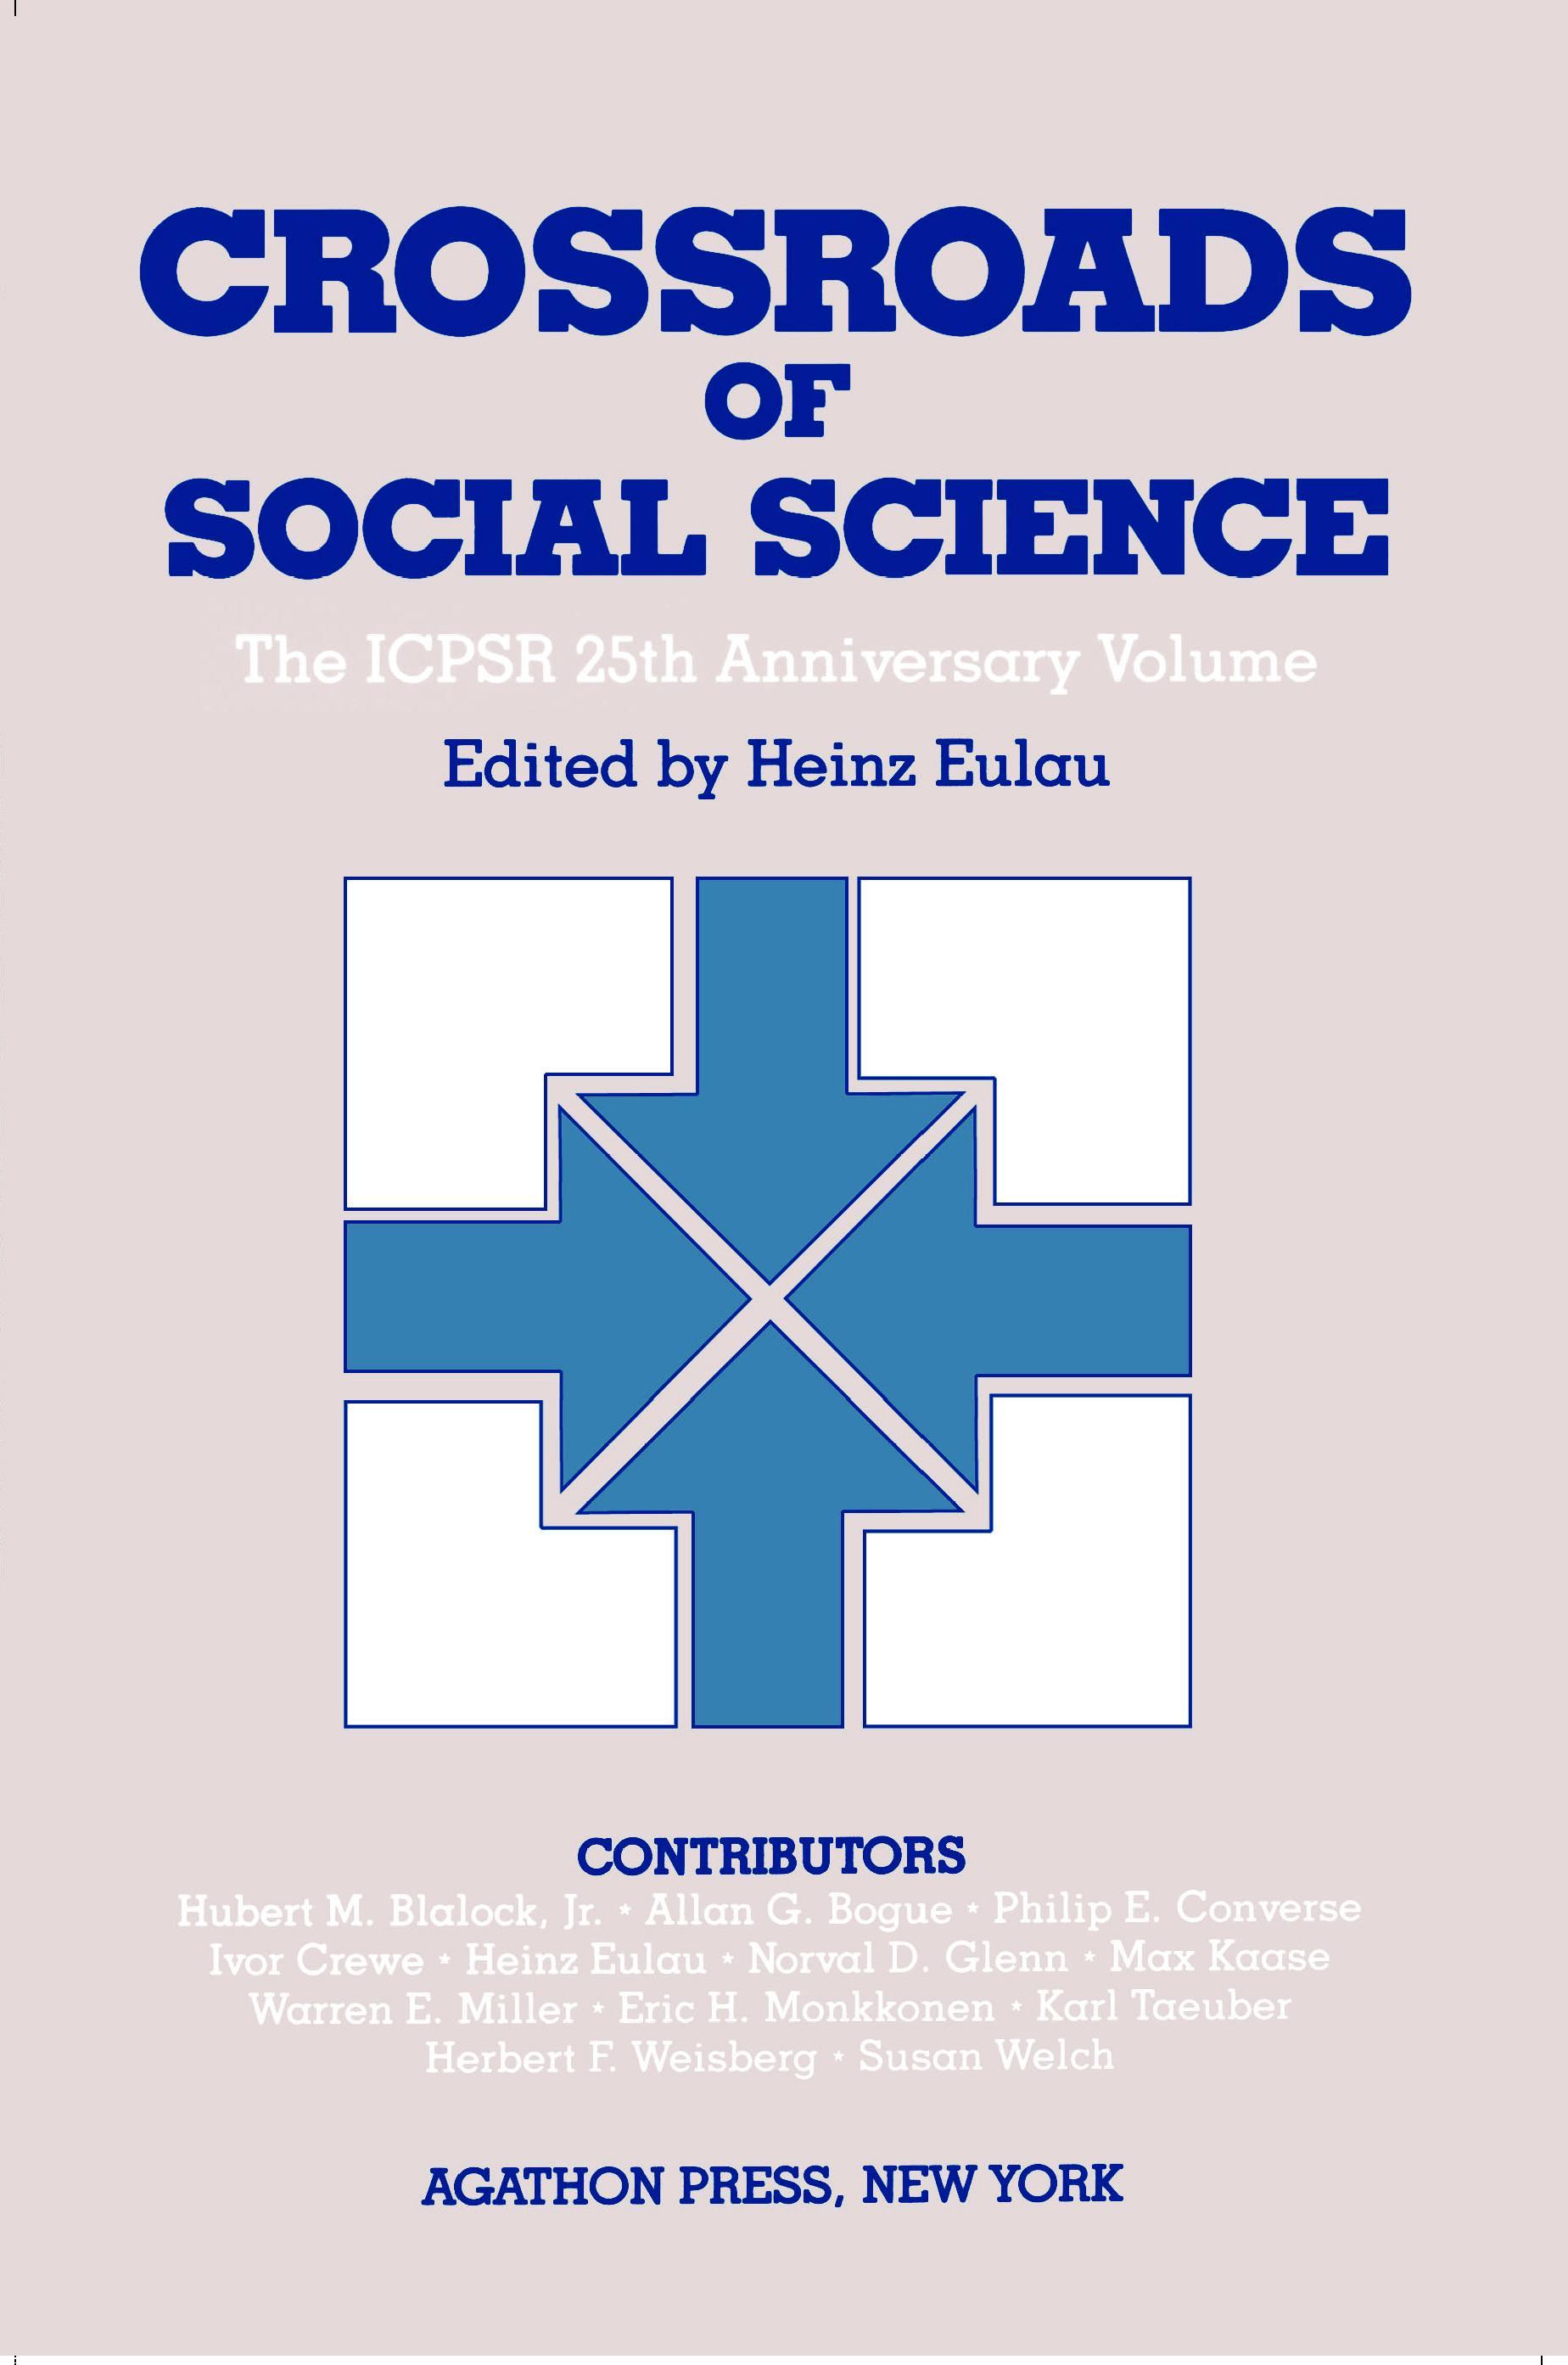 Crossroads of Social Science (ebook) EB9780875862705